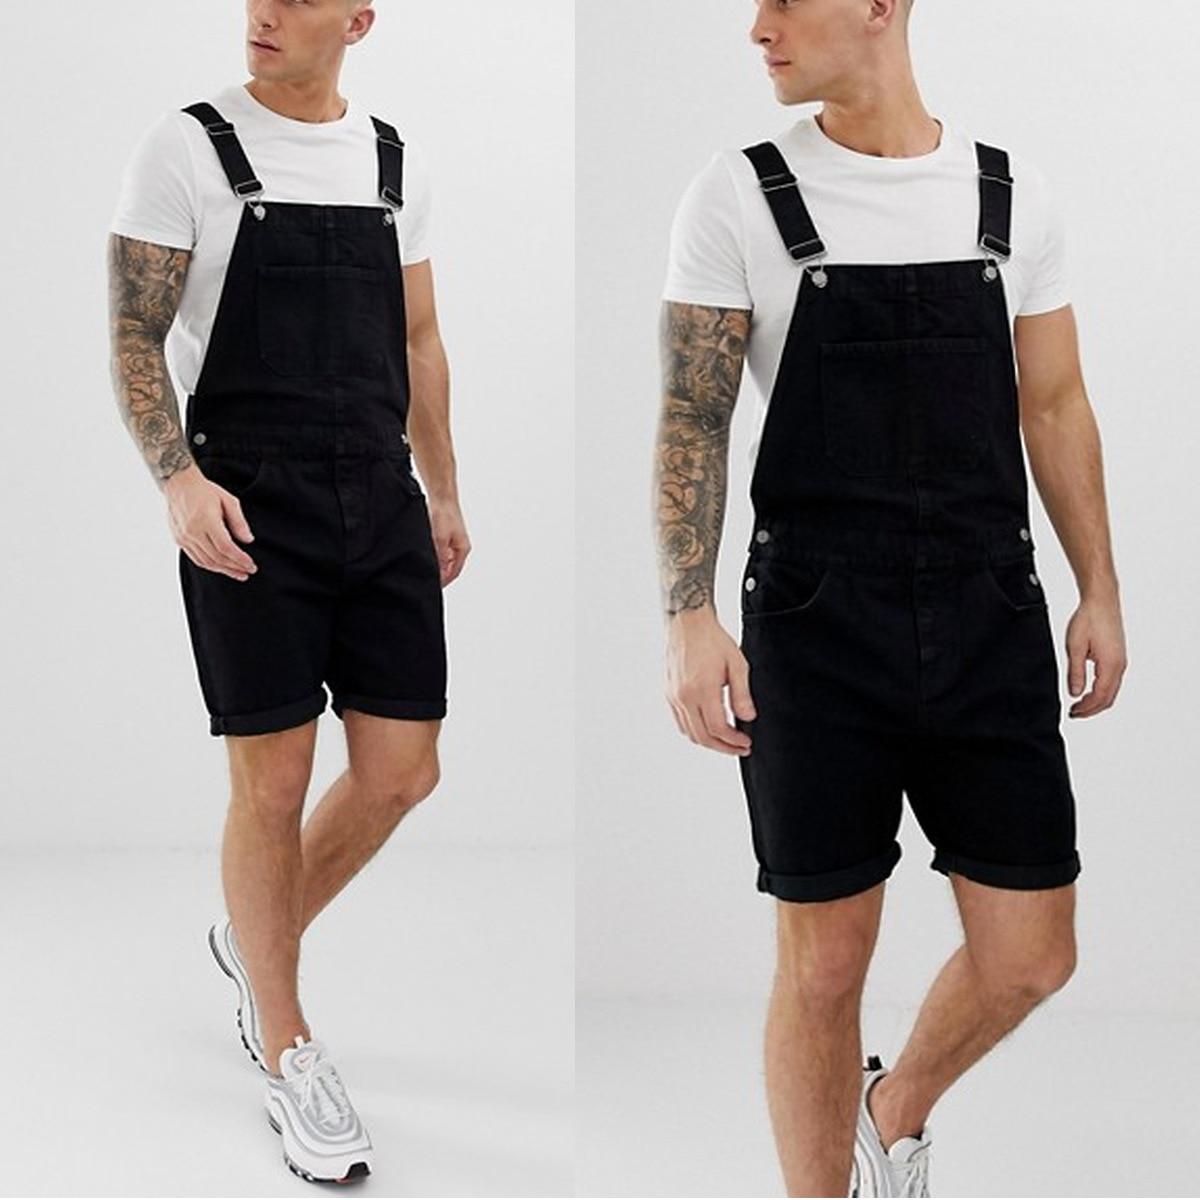 Newest Style Retro Men Cowboy Denim Short Trousers With Holes Shorts One-piece Working Bib Top Pants For Sale 2020 Men Clothes